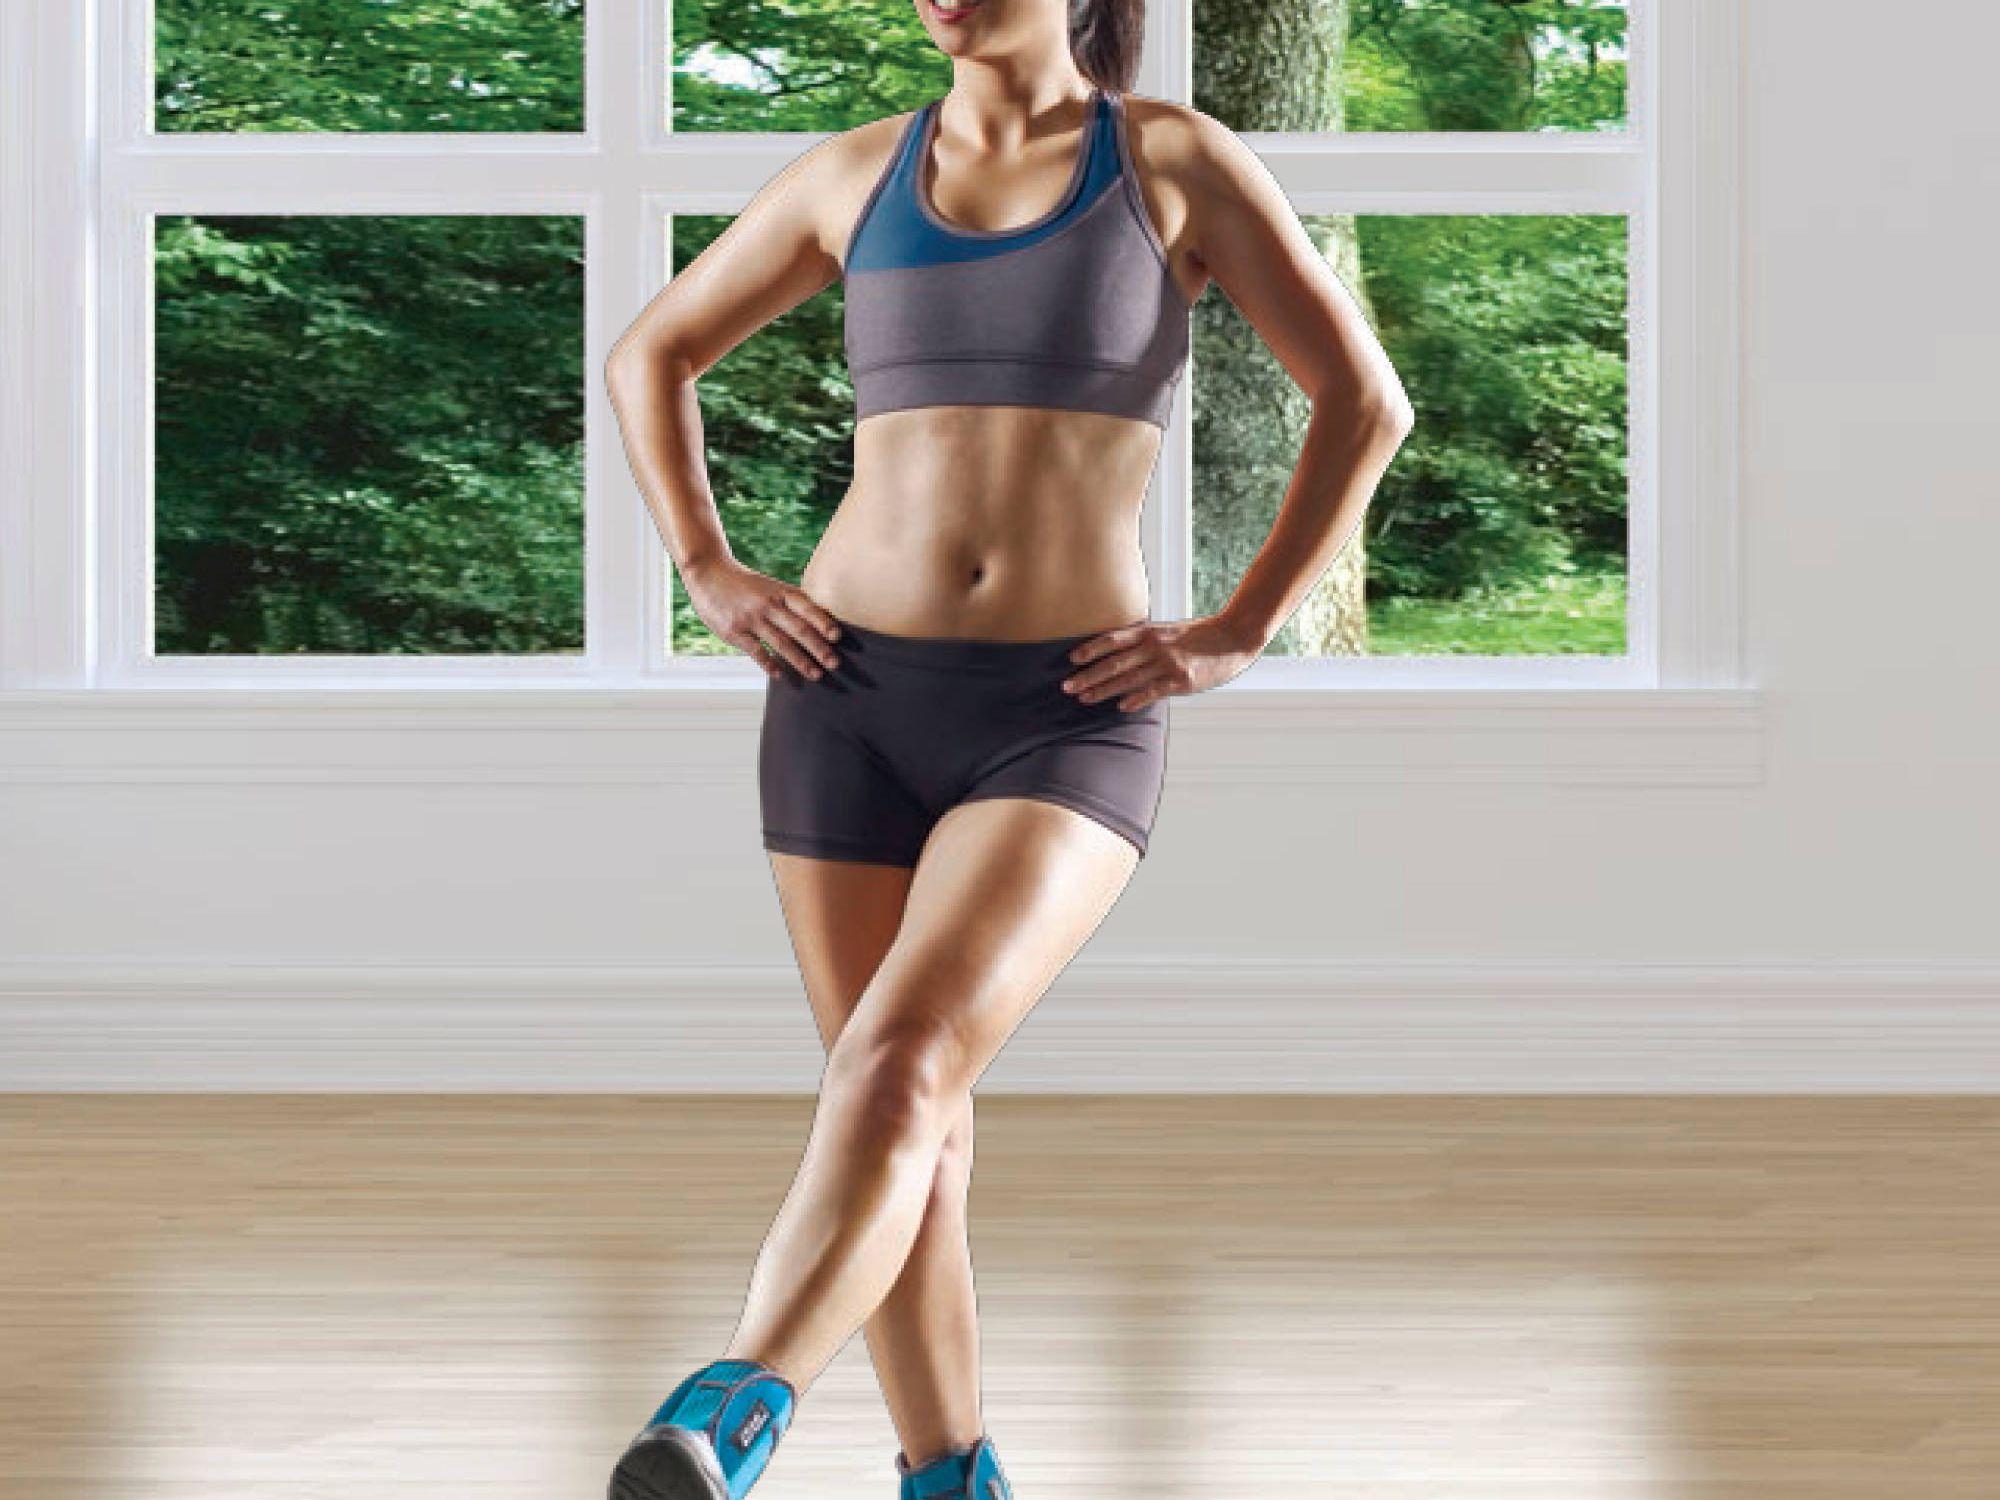 Adjustable Ankle Wrist Weights Comfort Fit Set for Men Women Kids Gym Exercise S